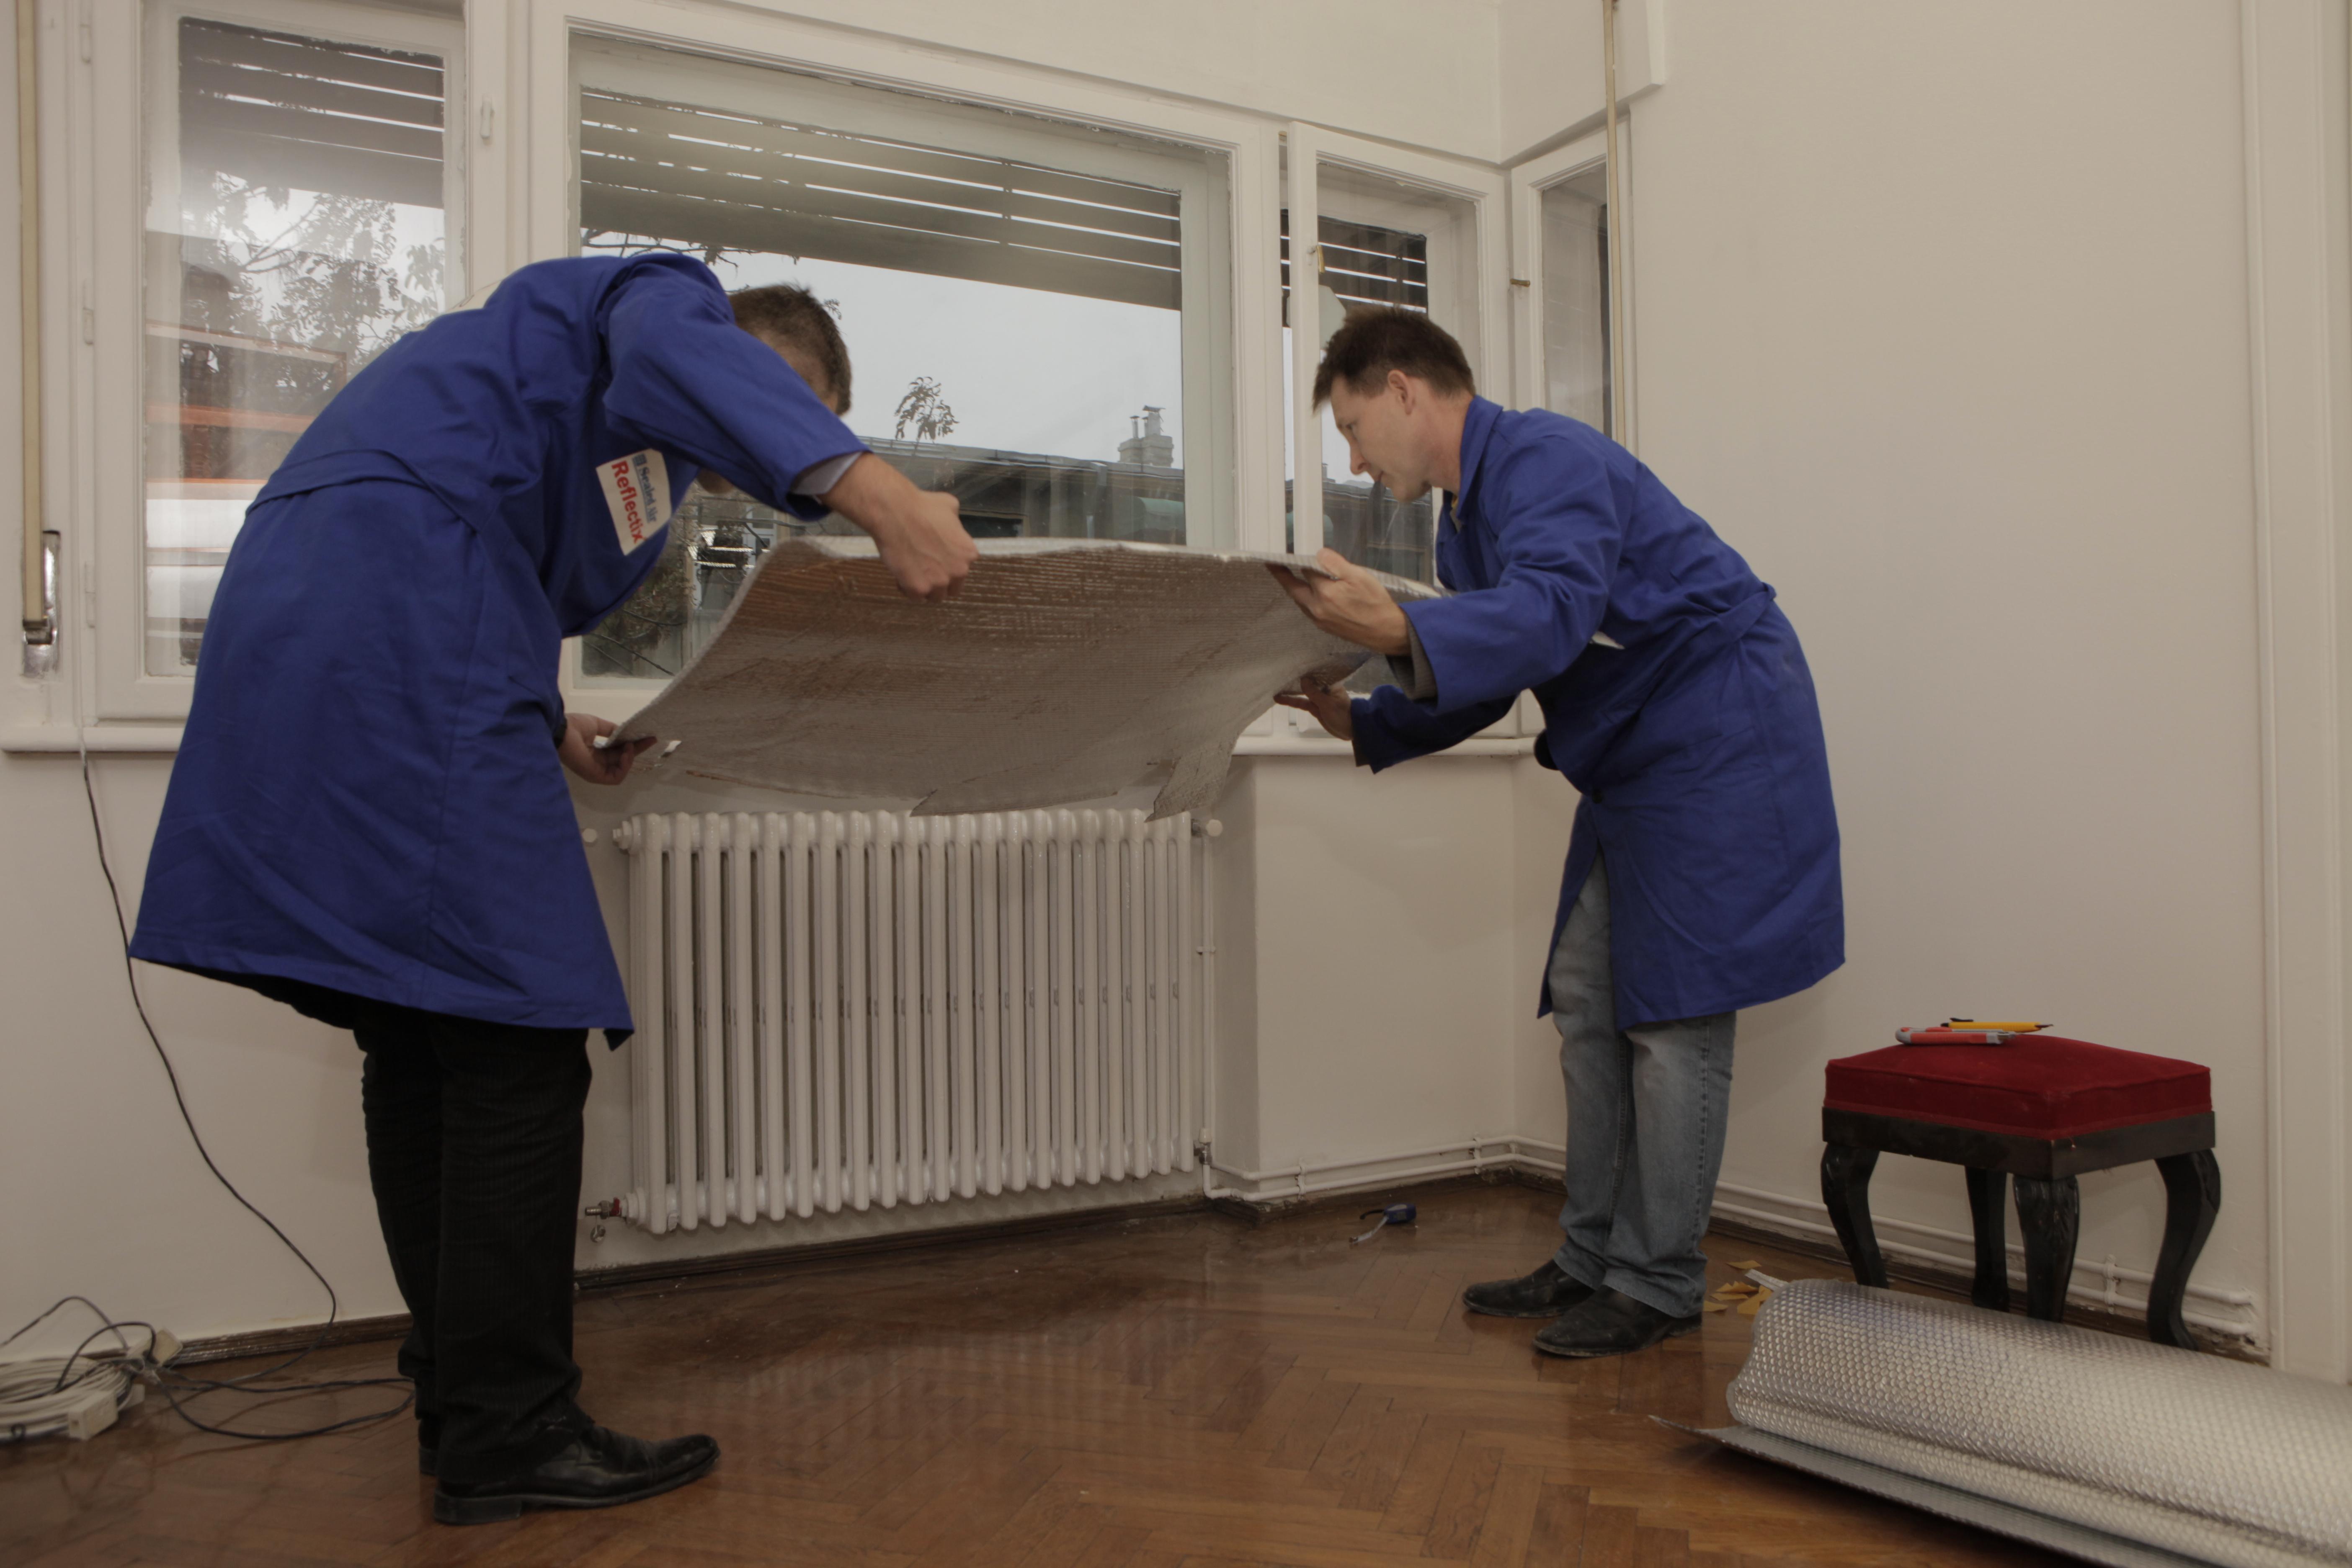 Folie termoizolanta utlilizata ca bariera radianta in spatele radiatoarelor REFLECTIX - Poza 3